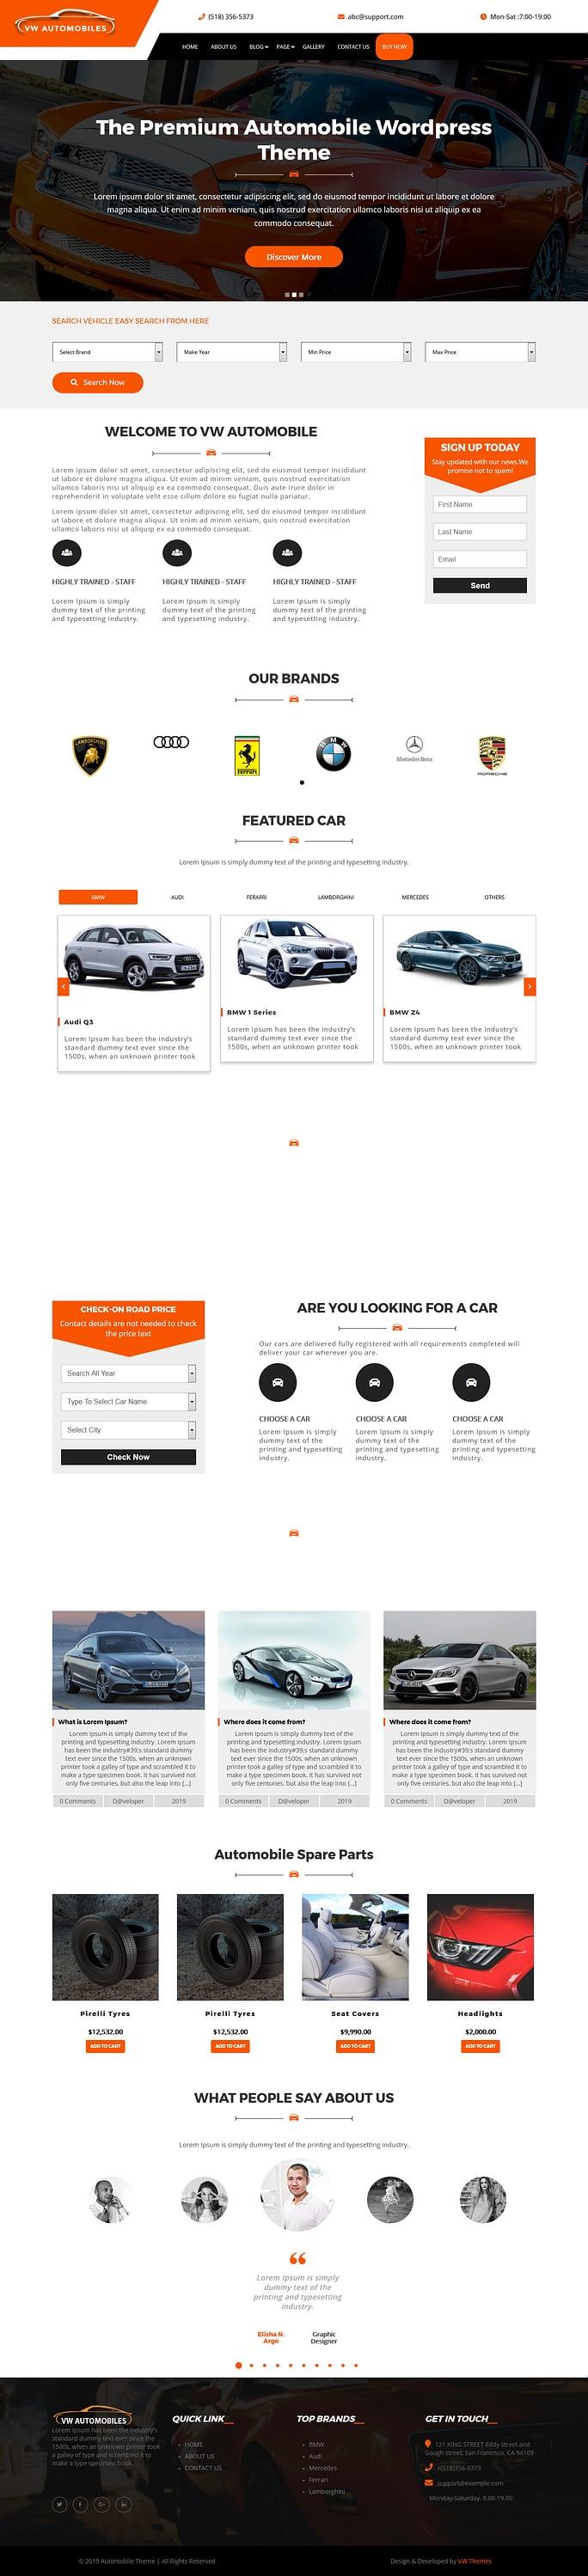 VW automobile - Best Free Automobile WordPress Theme